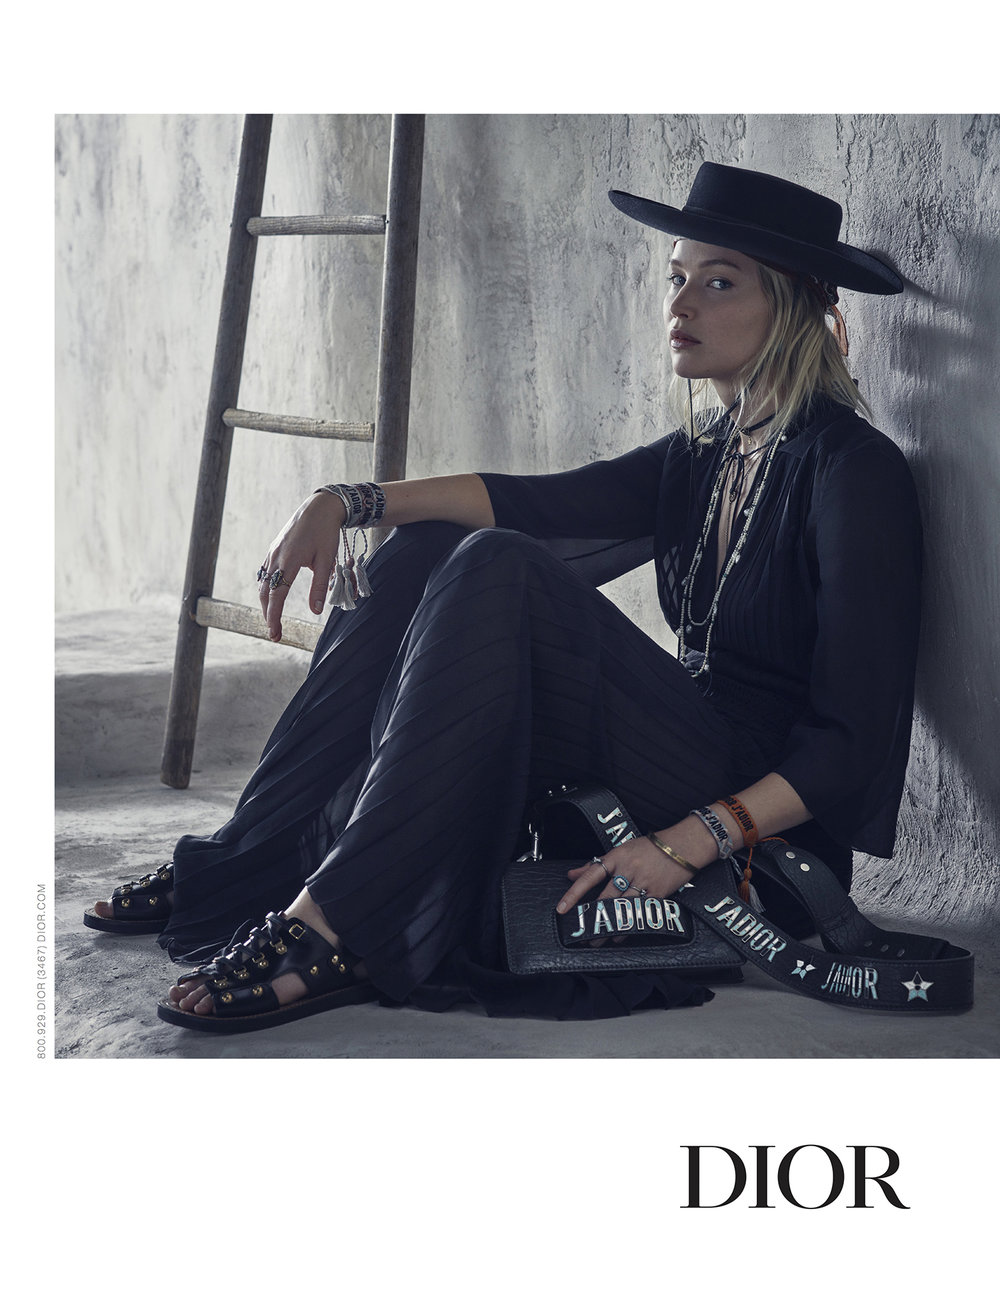 Dior Cruise 2018, Jennifer Lawrence